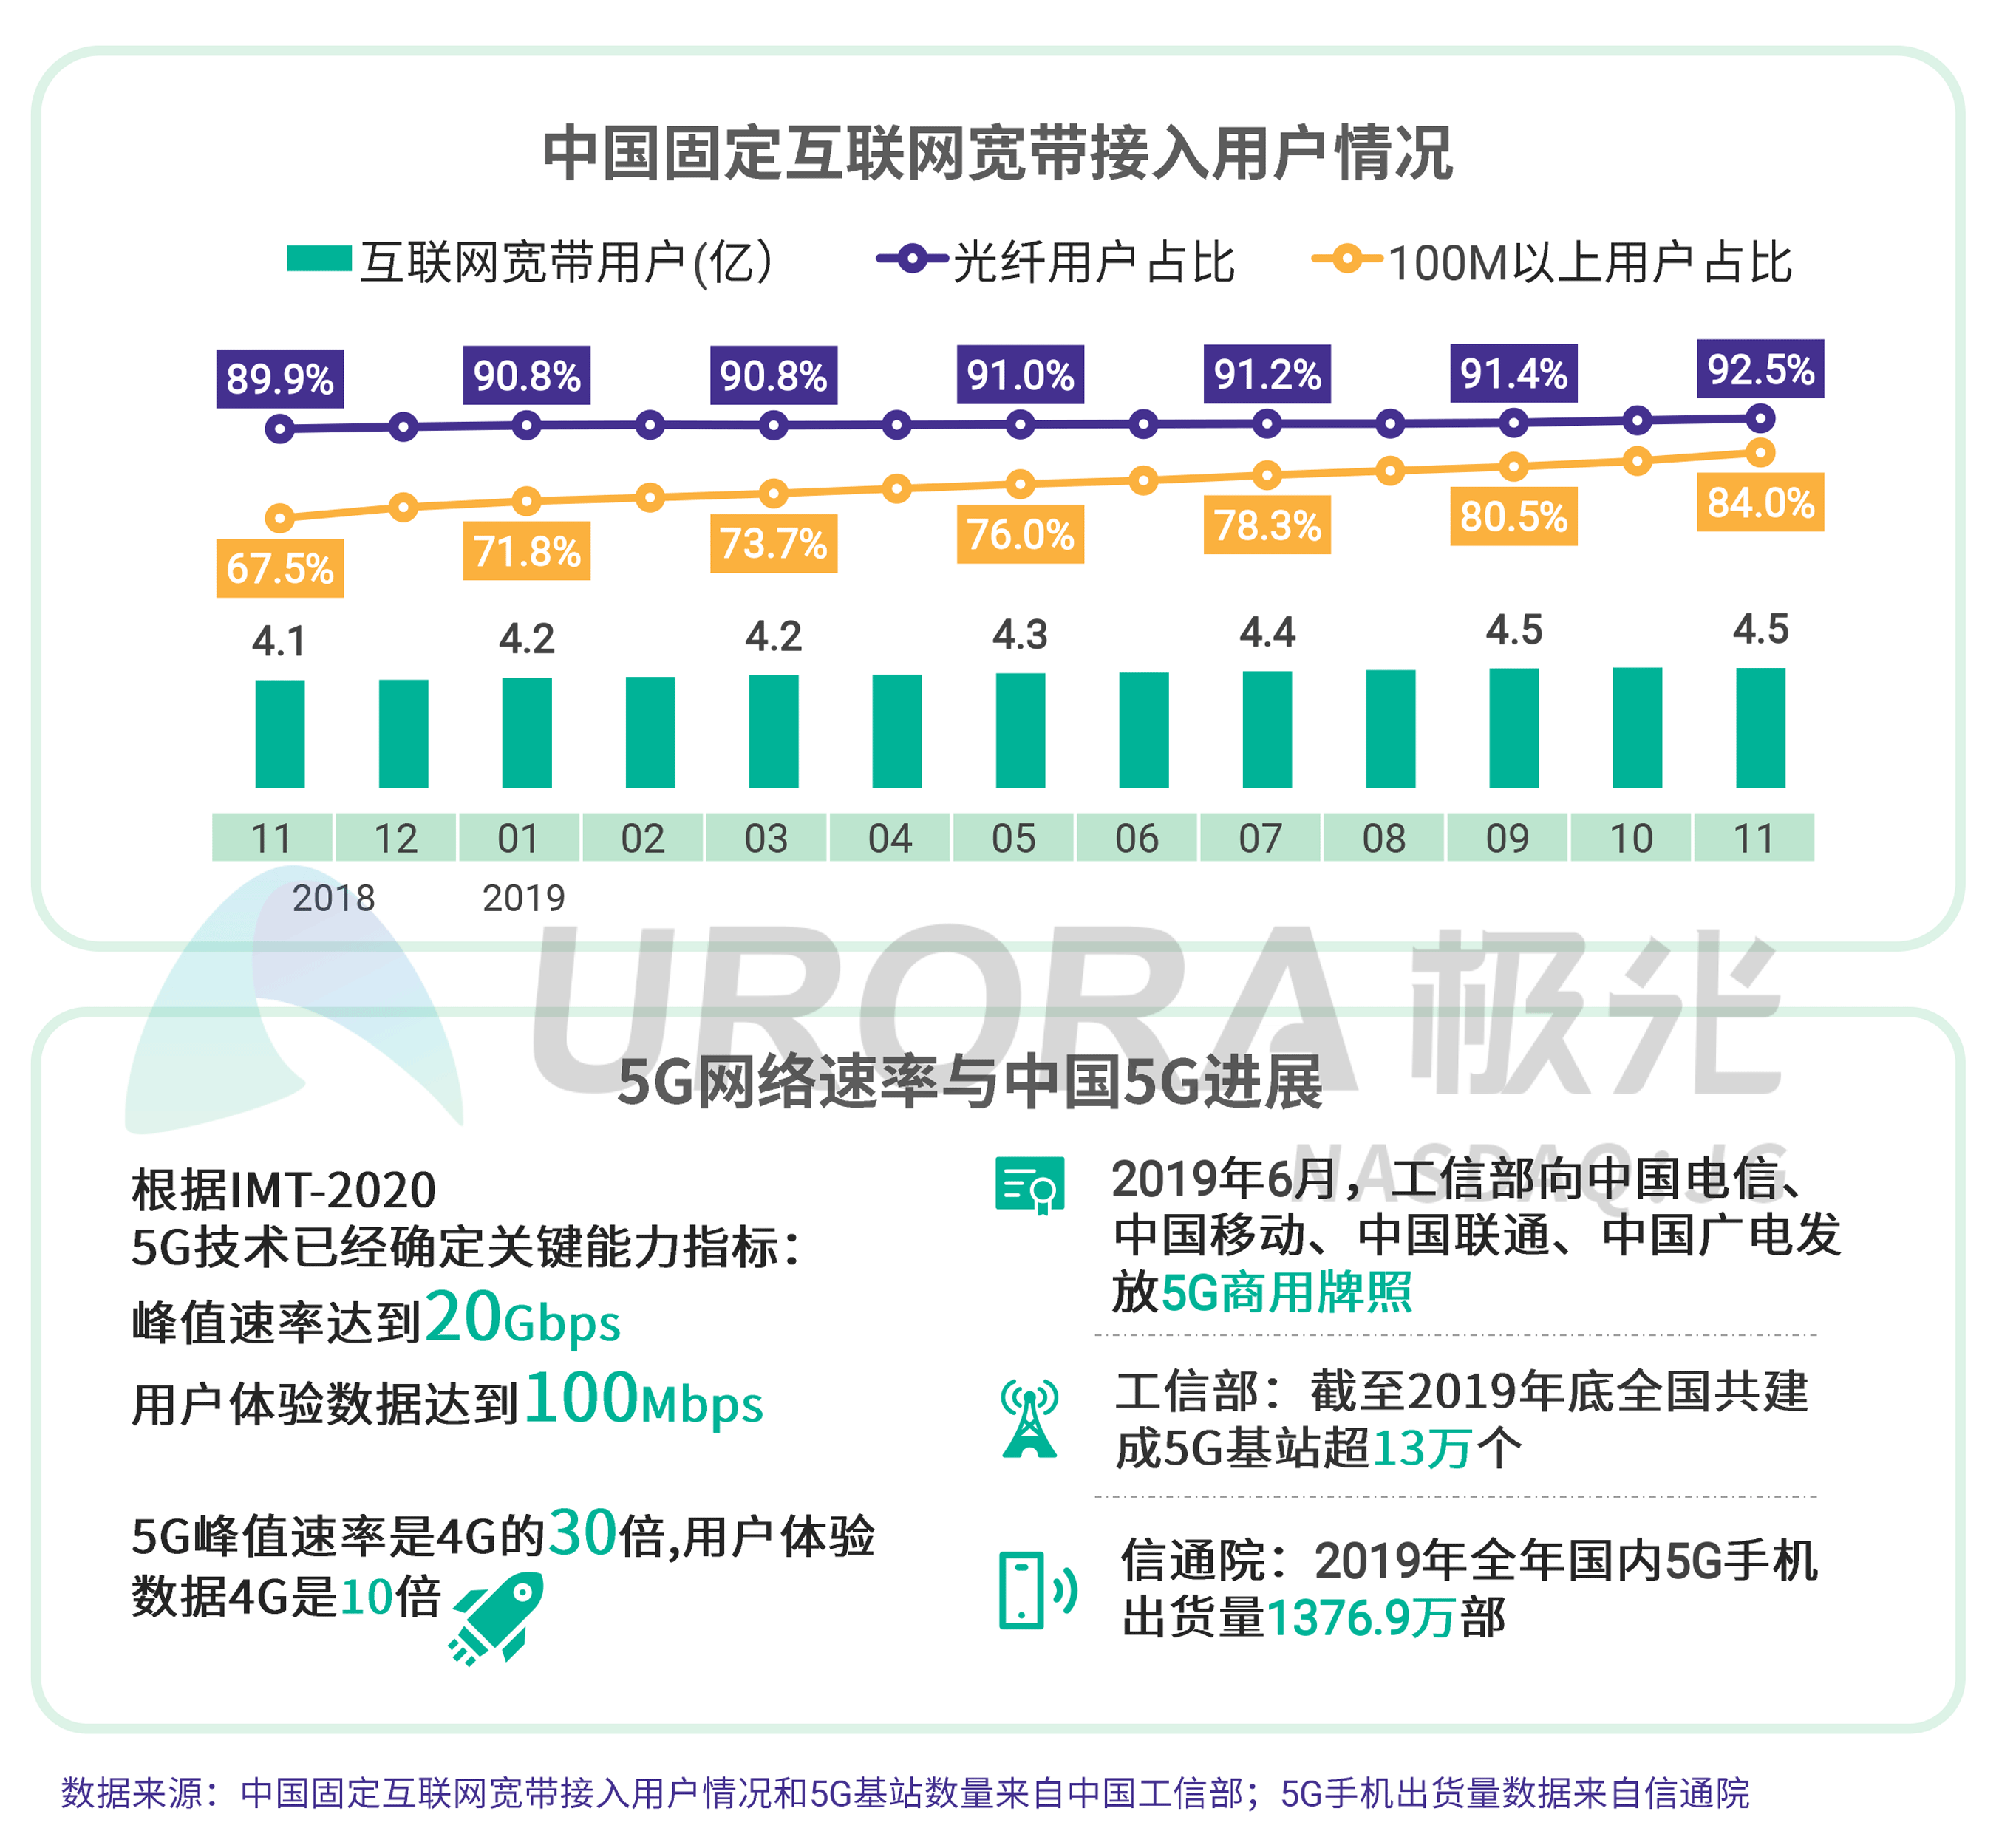 JIGUANG-个人网盘行业研究报告-final---切图版2-7.png